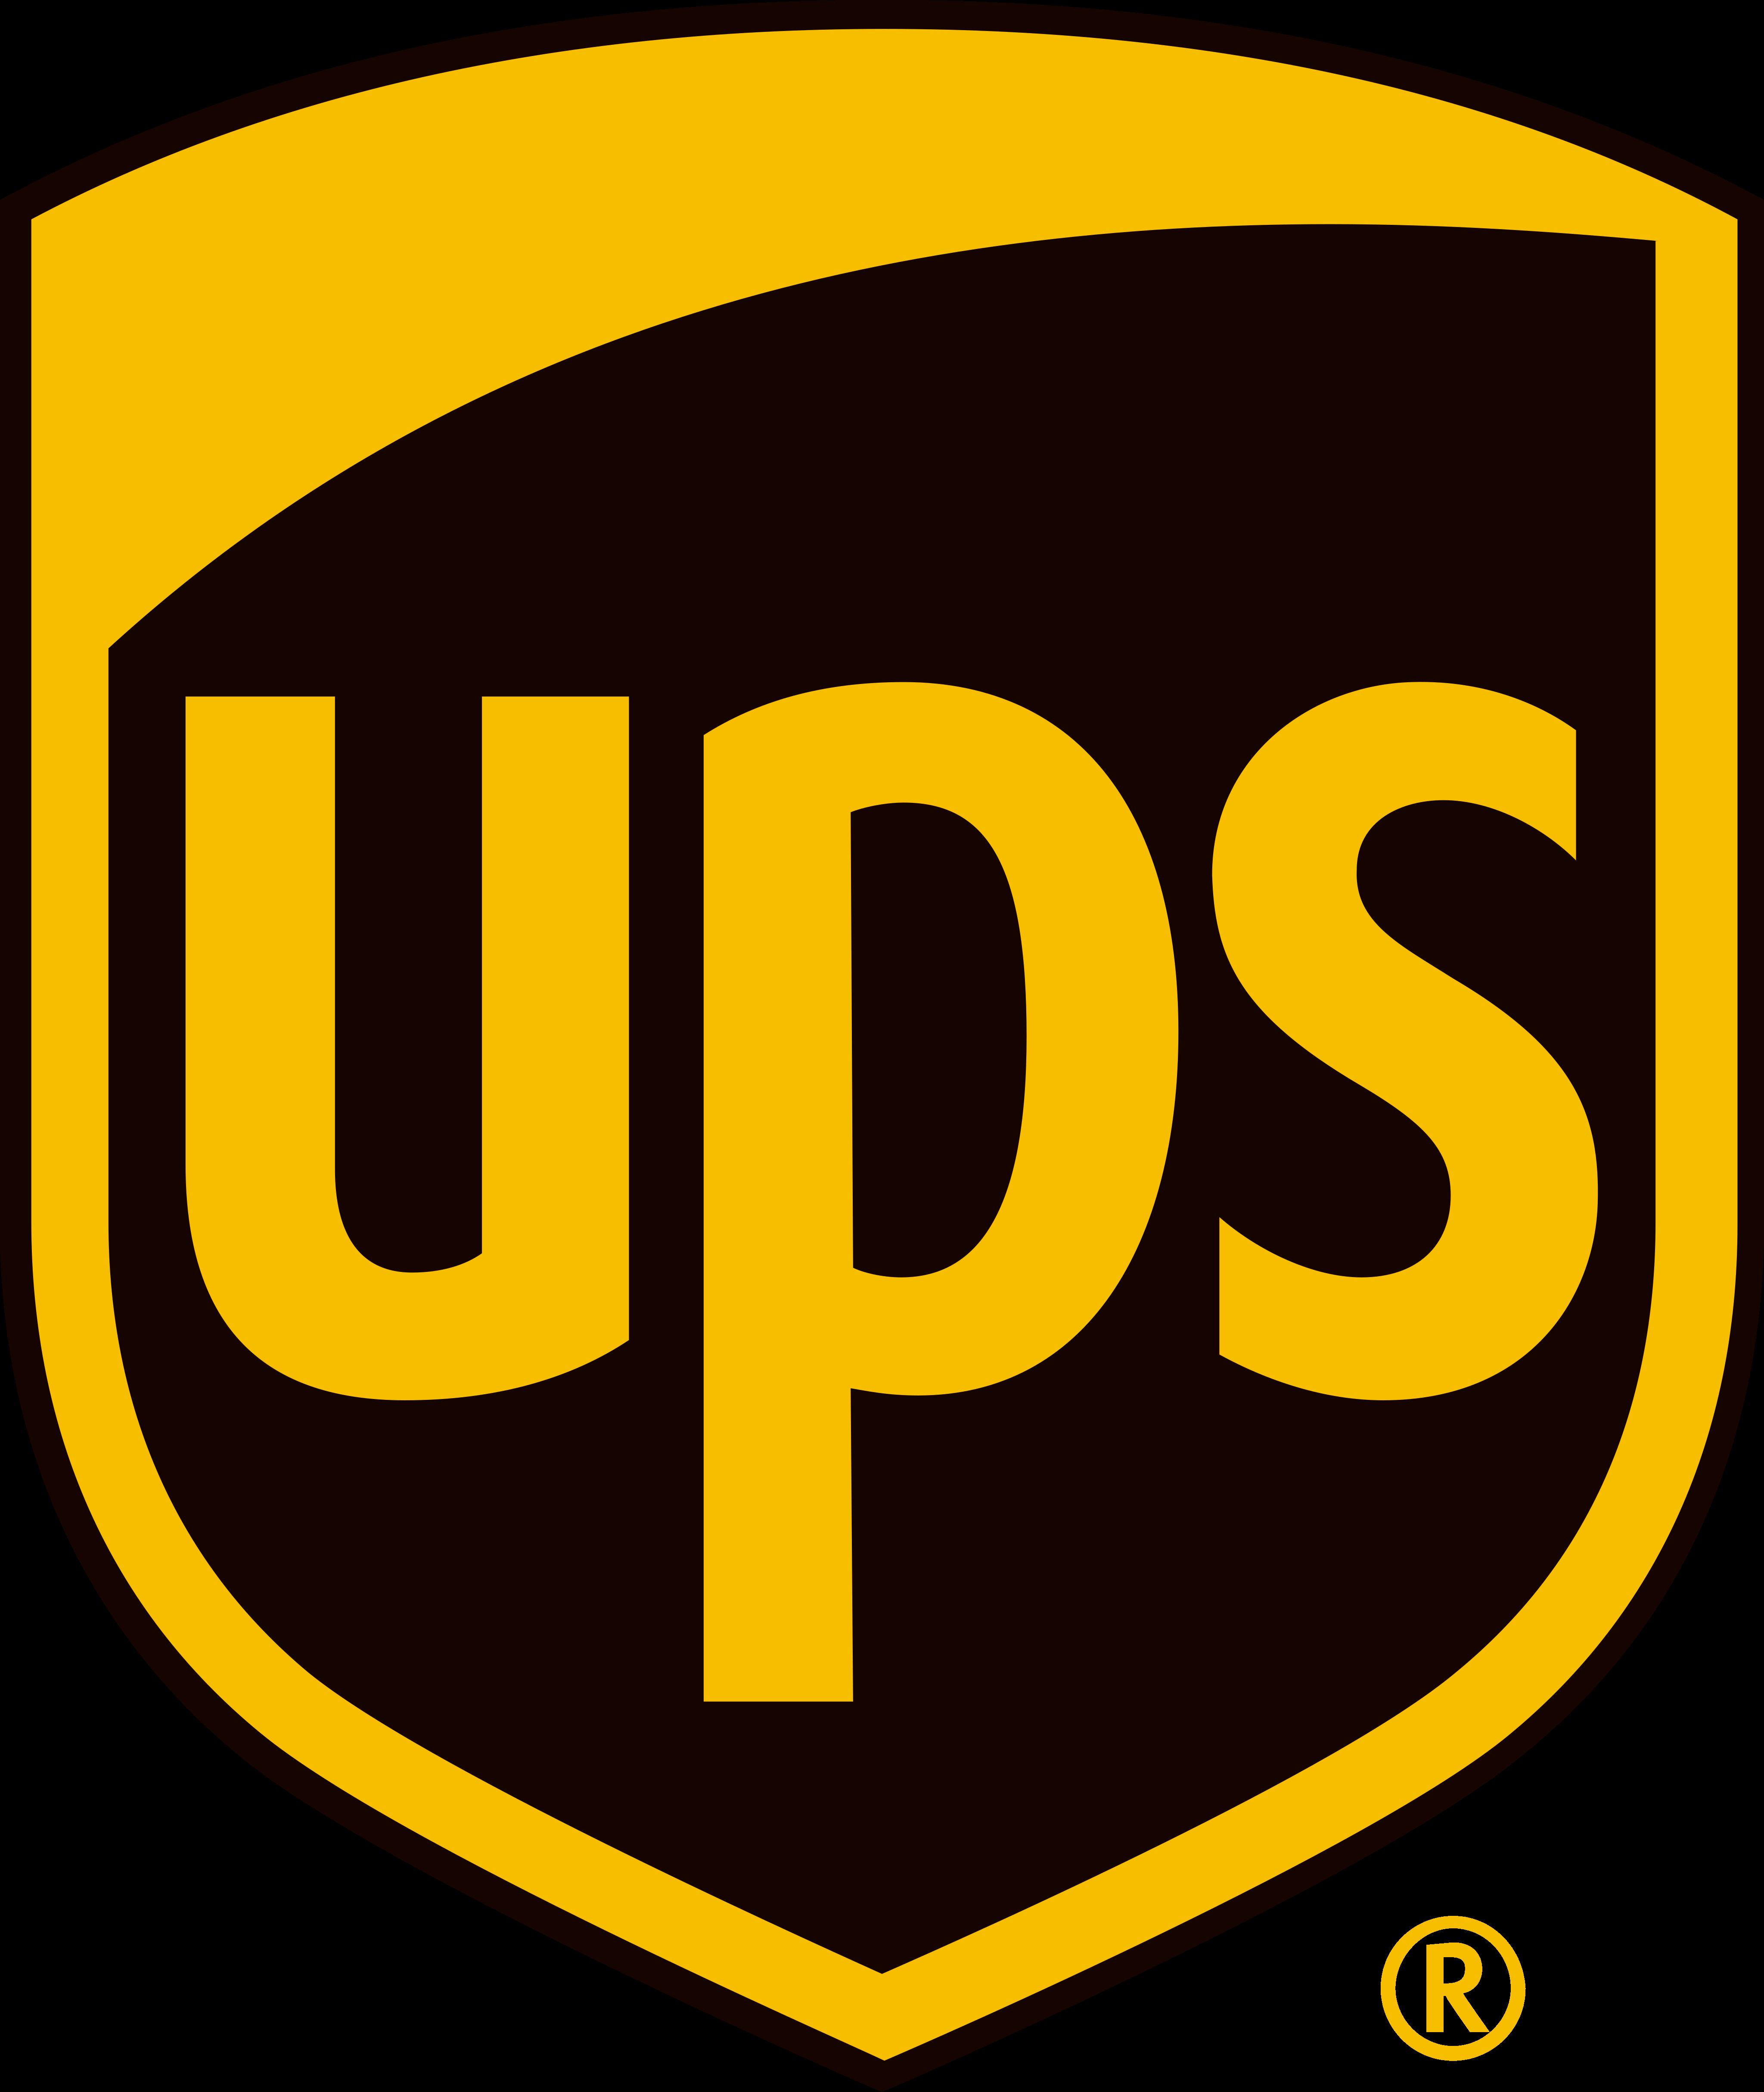 ups logo 2 - UPS Logo